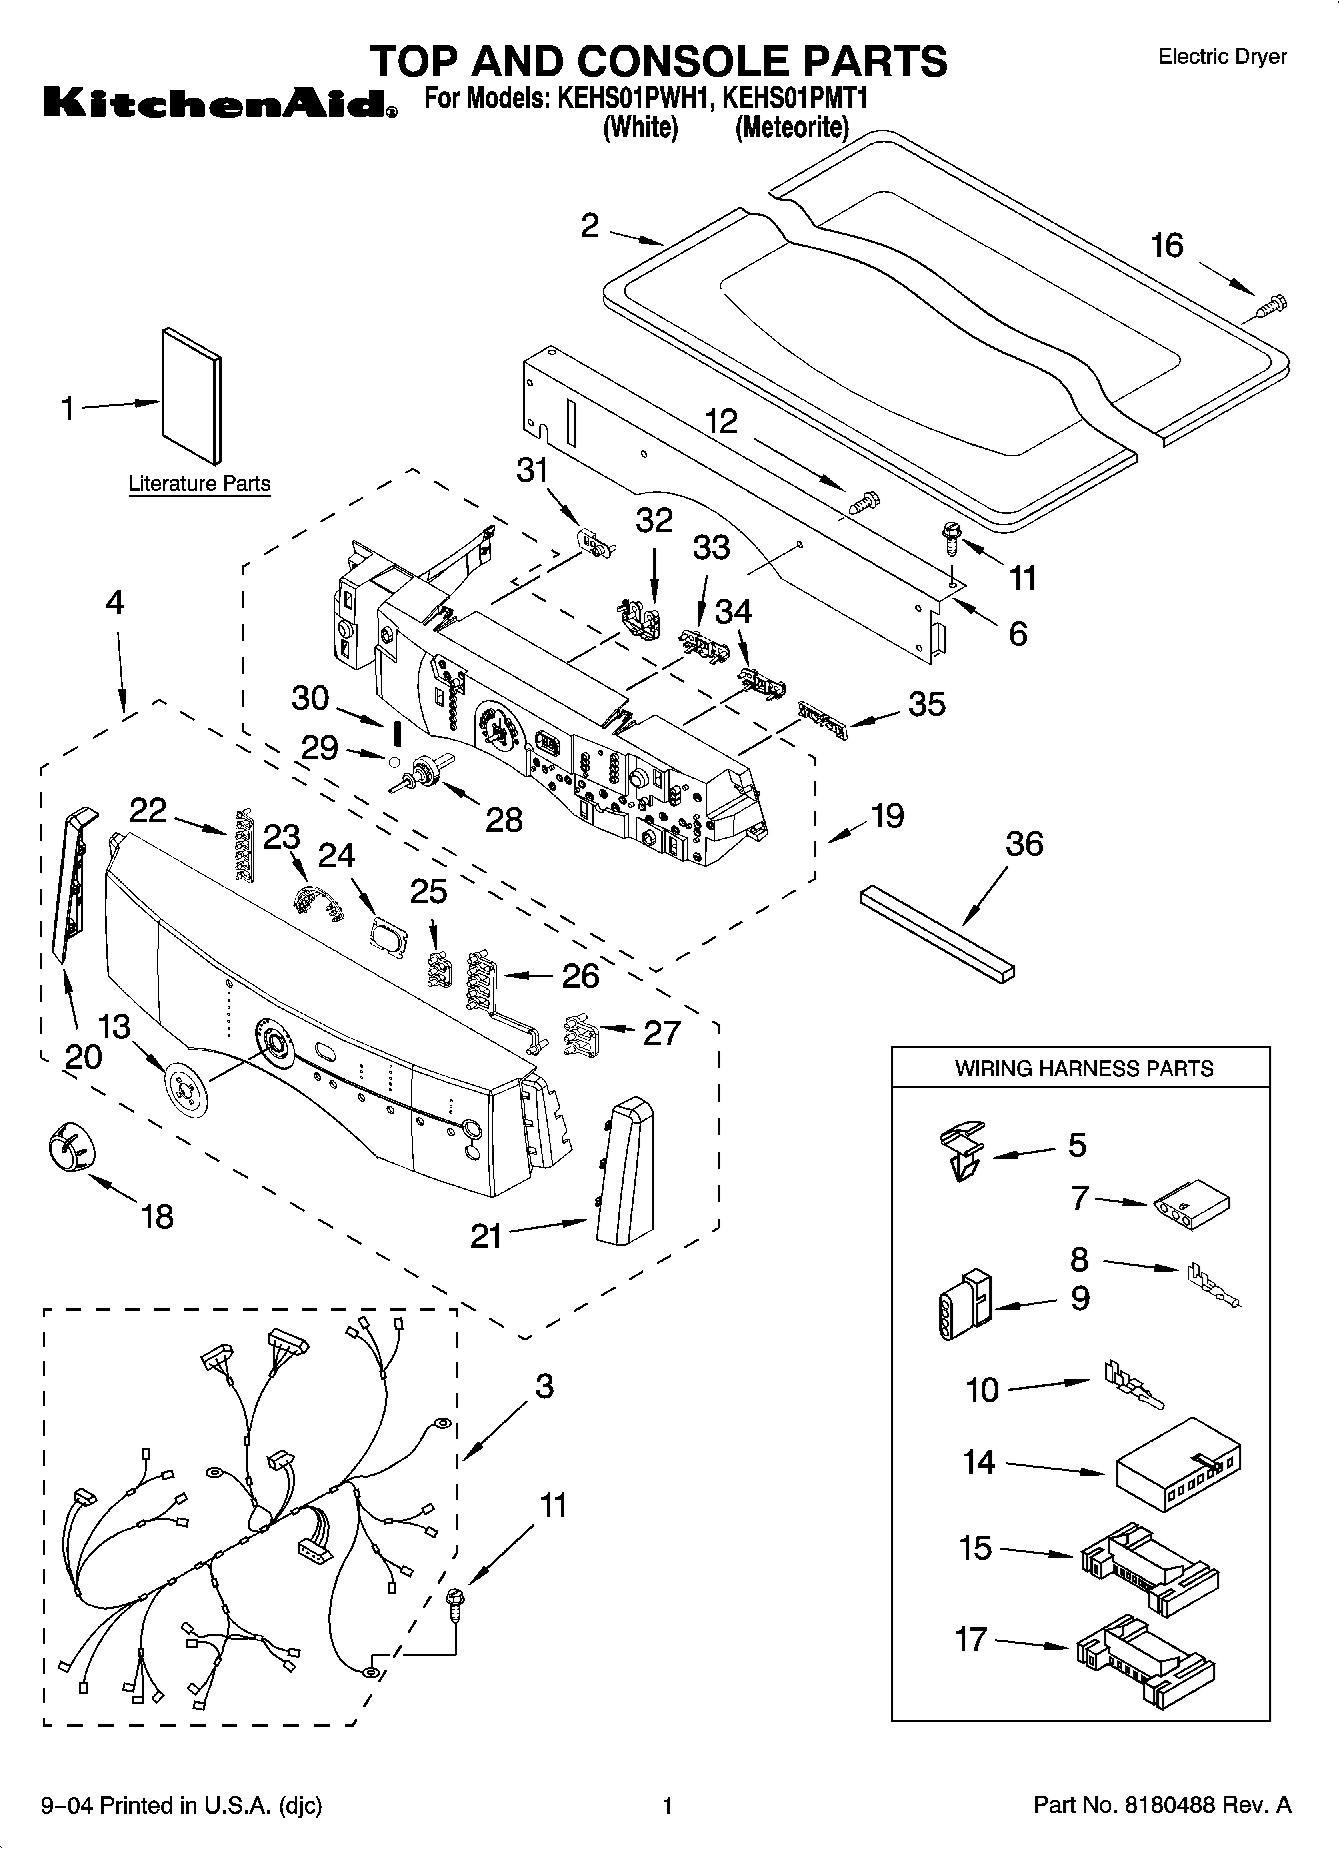 Wiring Diagram For Goodman Ac besides Chevrolet Vin Decoder Chart further Carrier Gas Furnace Wiring Diagram in addition US7017828 additionally 10527. on tempstar wiring diagram